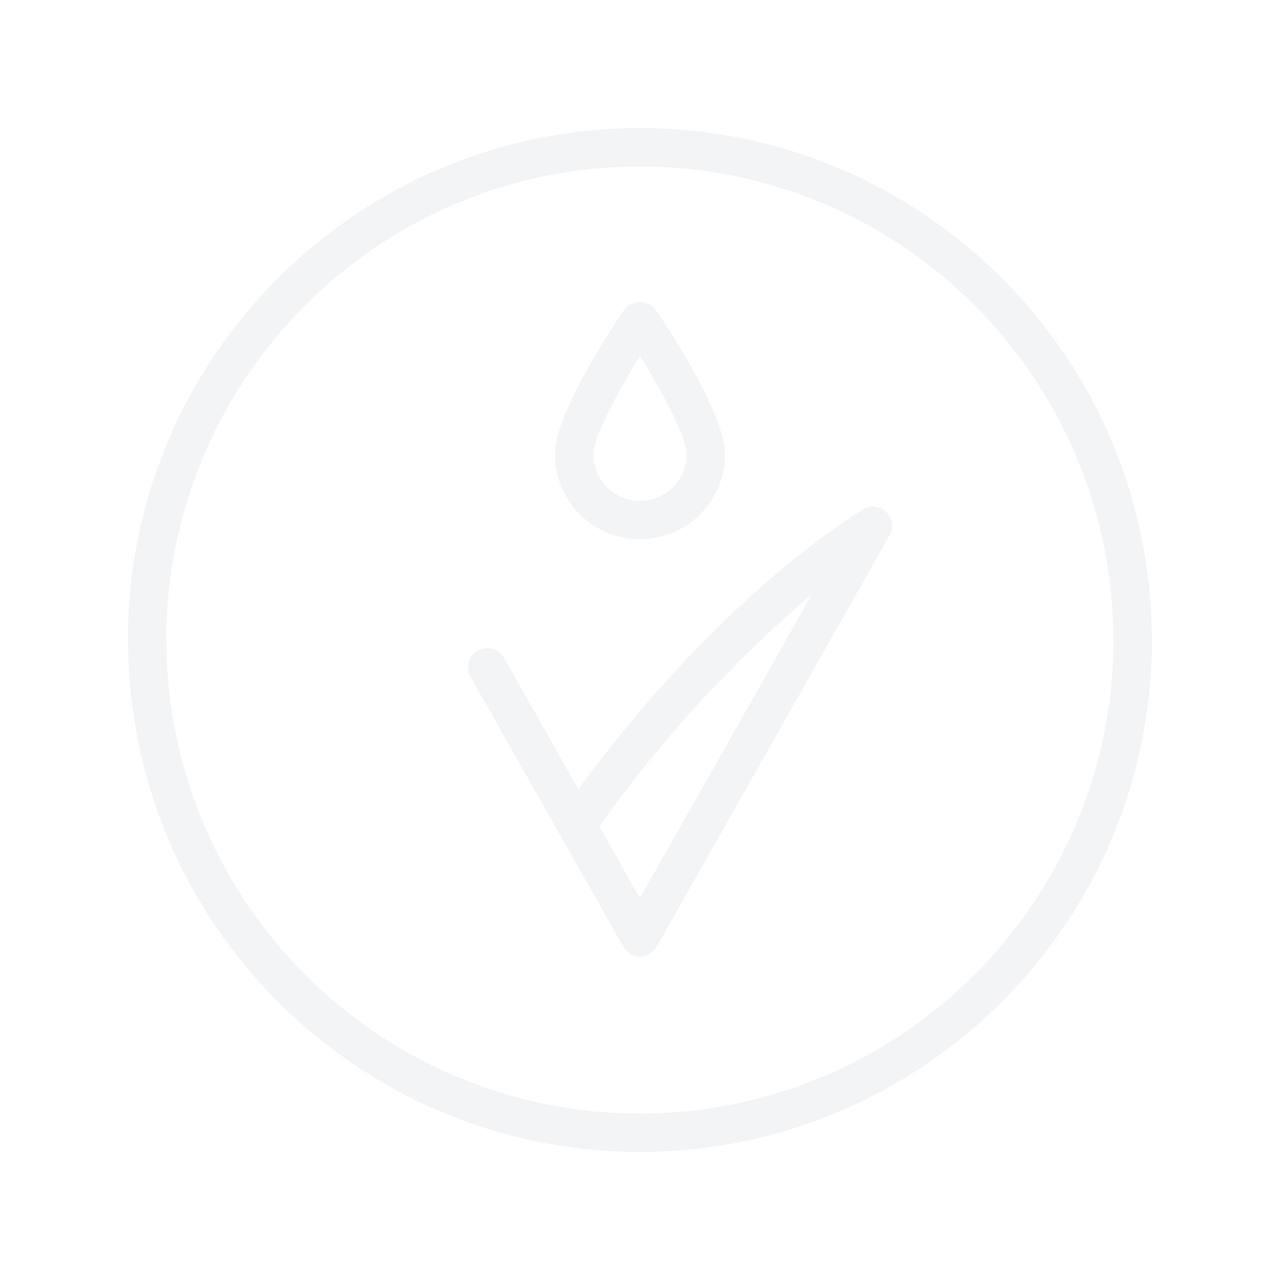 GOSH Donoderm Micellar Cleansing Wipes 20pcs